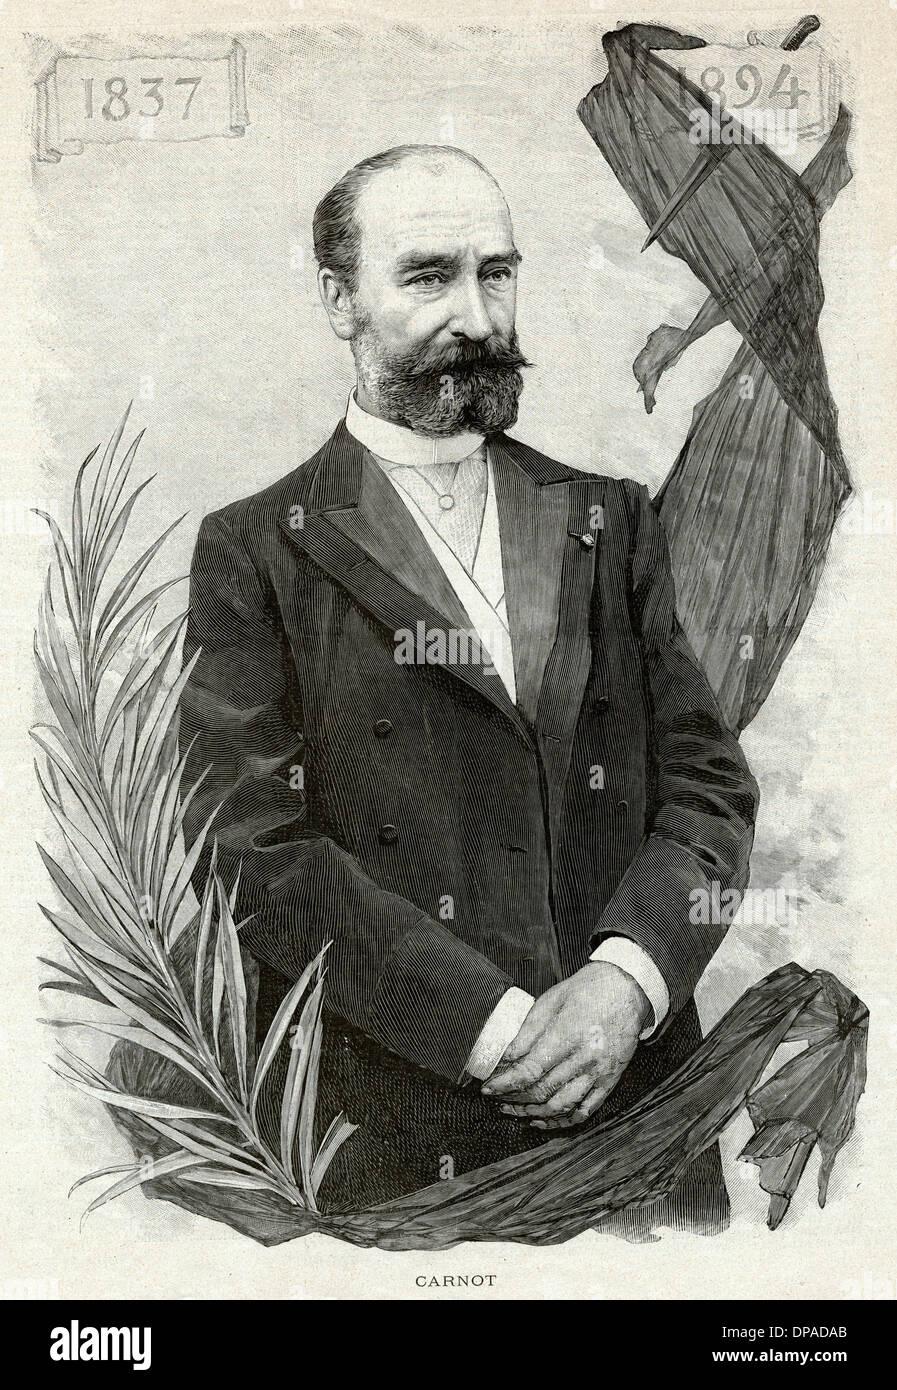 MFS CARNOT/ILS 1894 - Stock Image